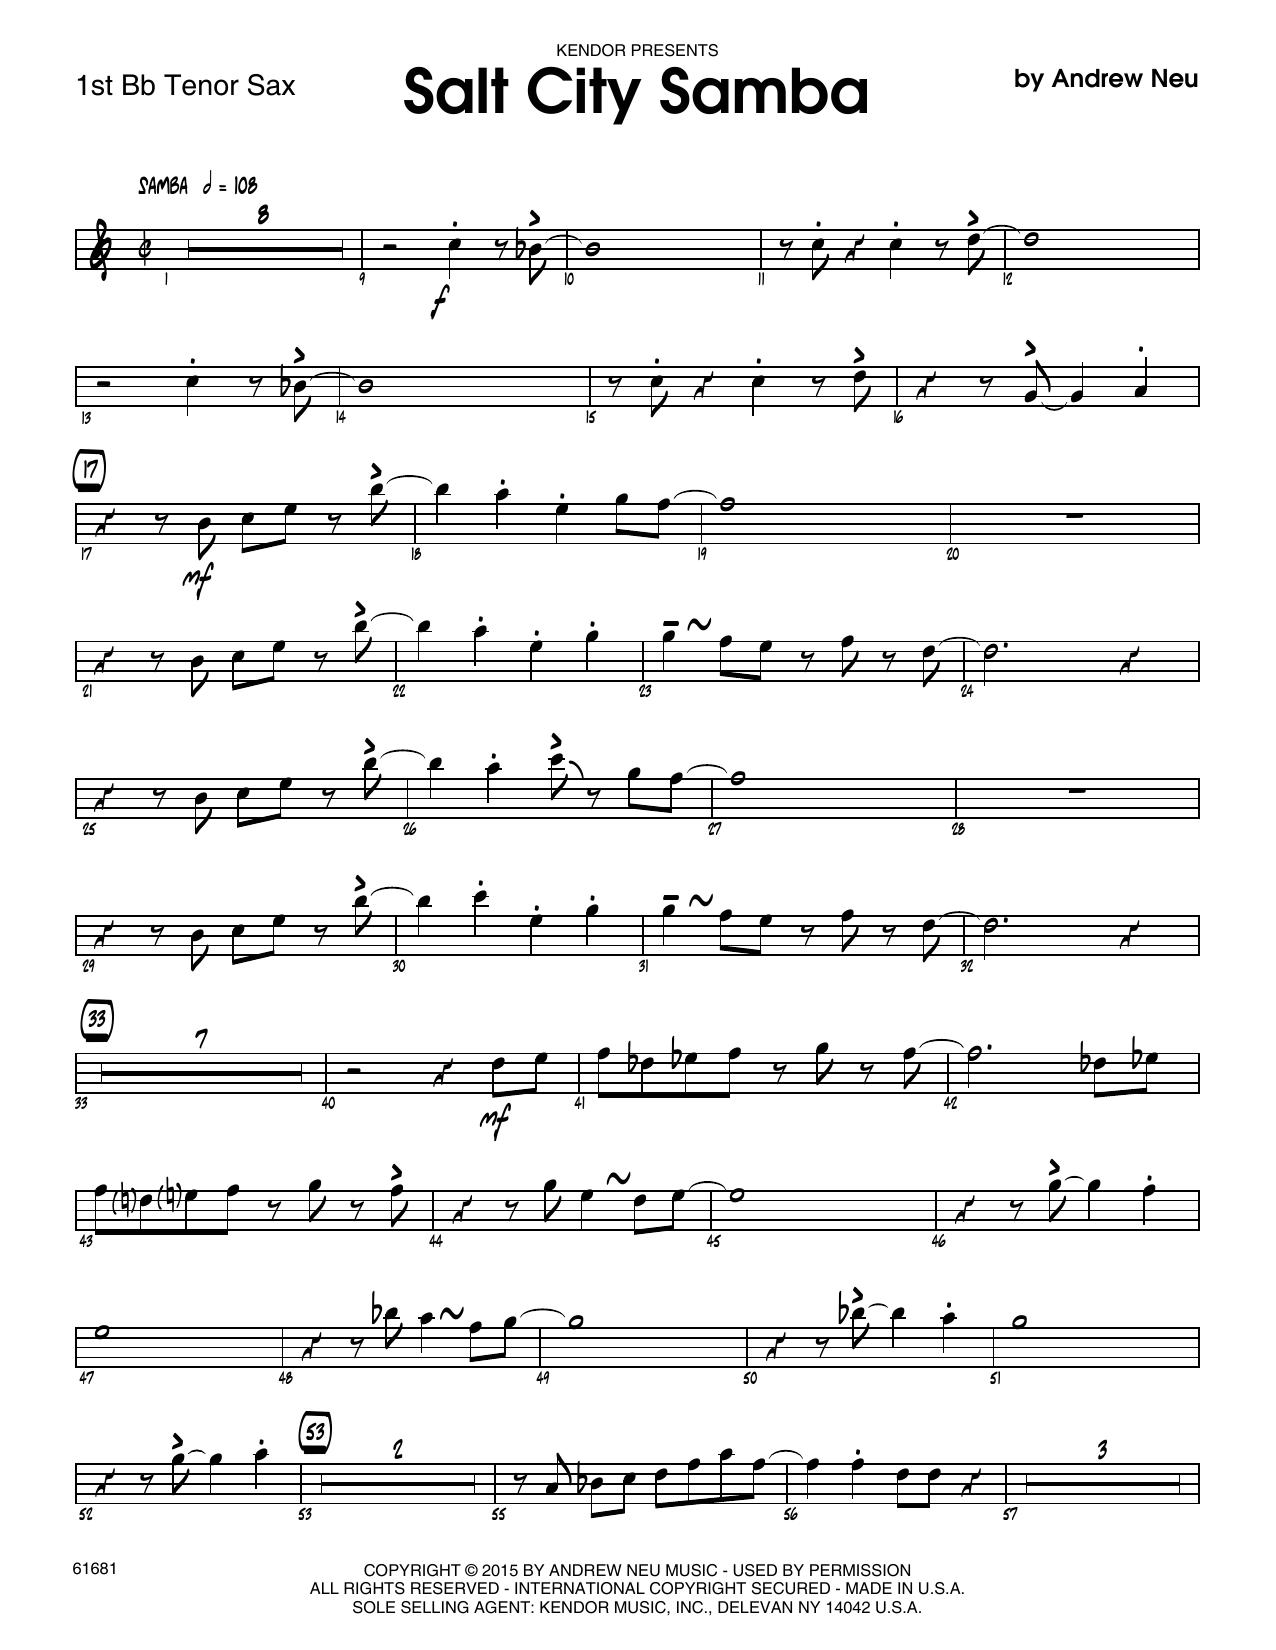 Salt City Samba - 1st Tenor Saxophone